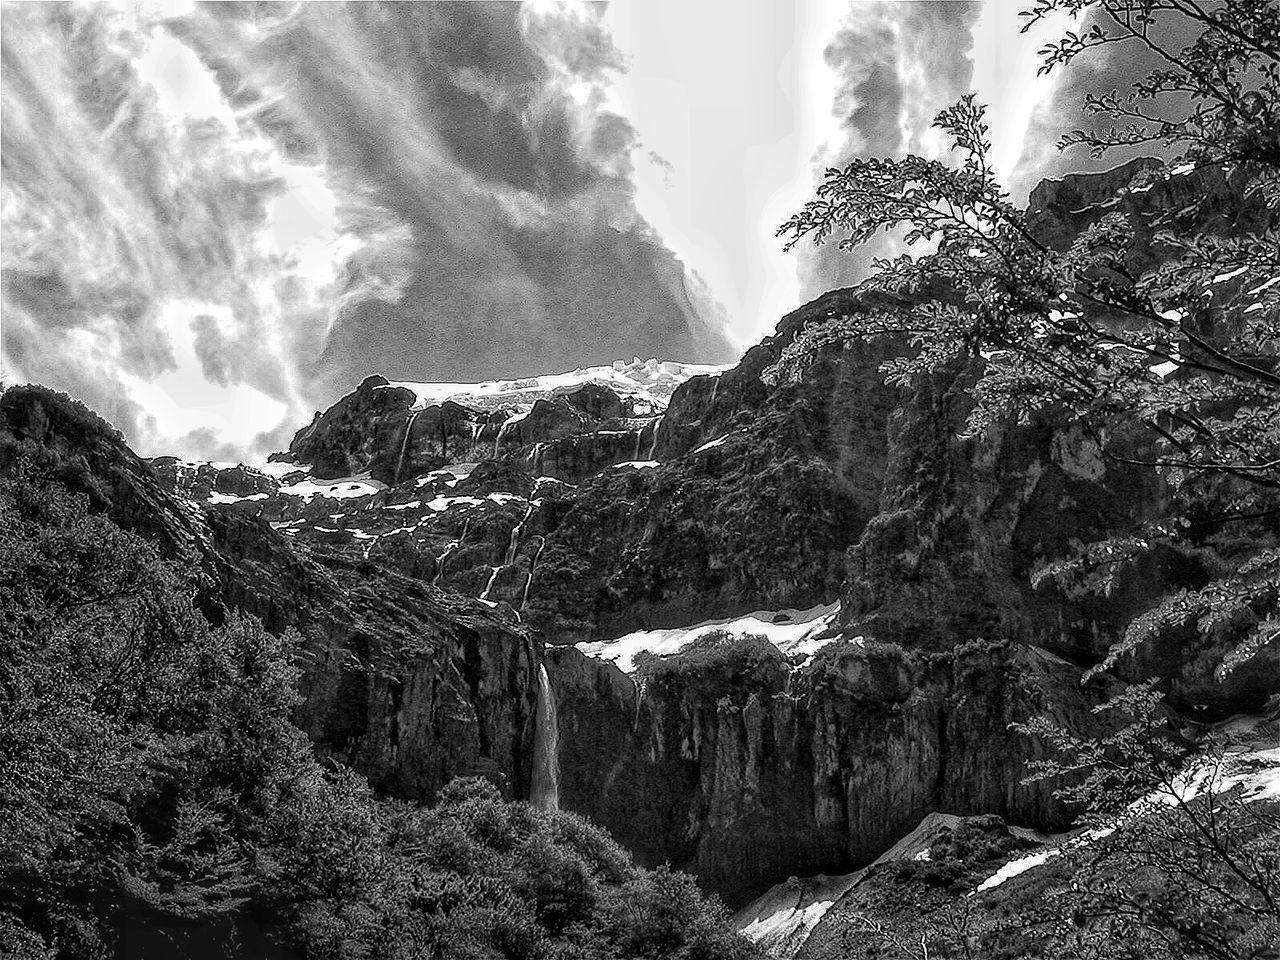 http://youtu.be/JddeyoTcs44 Cerro Tronador Enjoying Life EyeEm Bnw Somosfelices No Dejes De Soñar